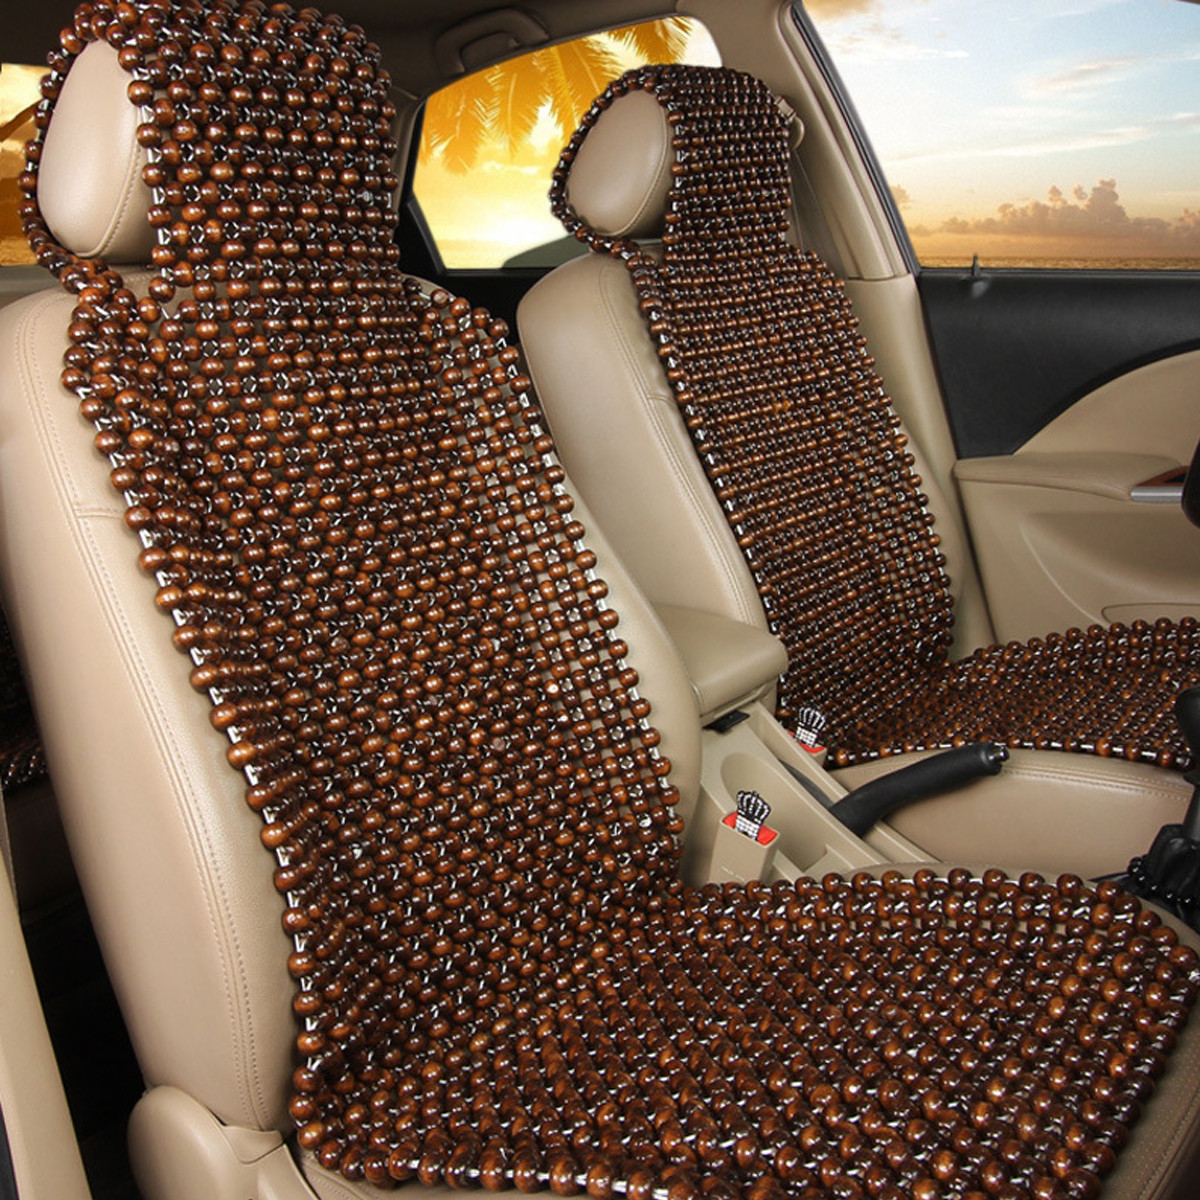 2 x BLACK WOODEN BEAD BEADED CAR TAXI VAN CHAIR MASSAGE SEAT PAIR CUSHION COVER